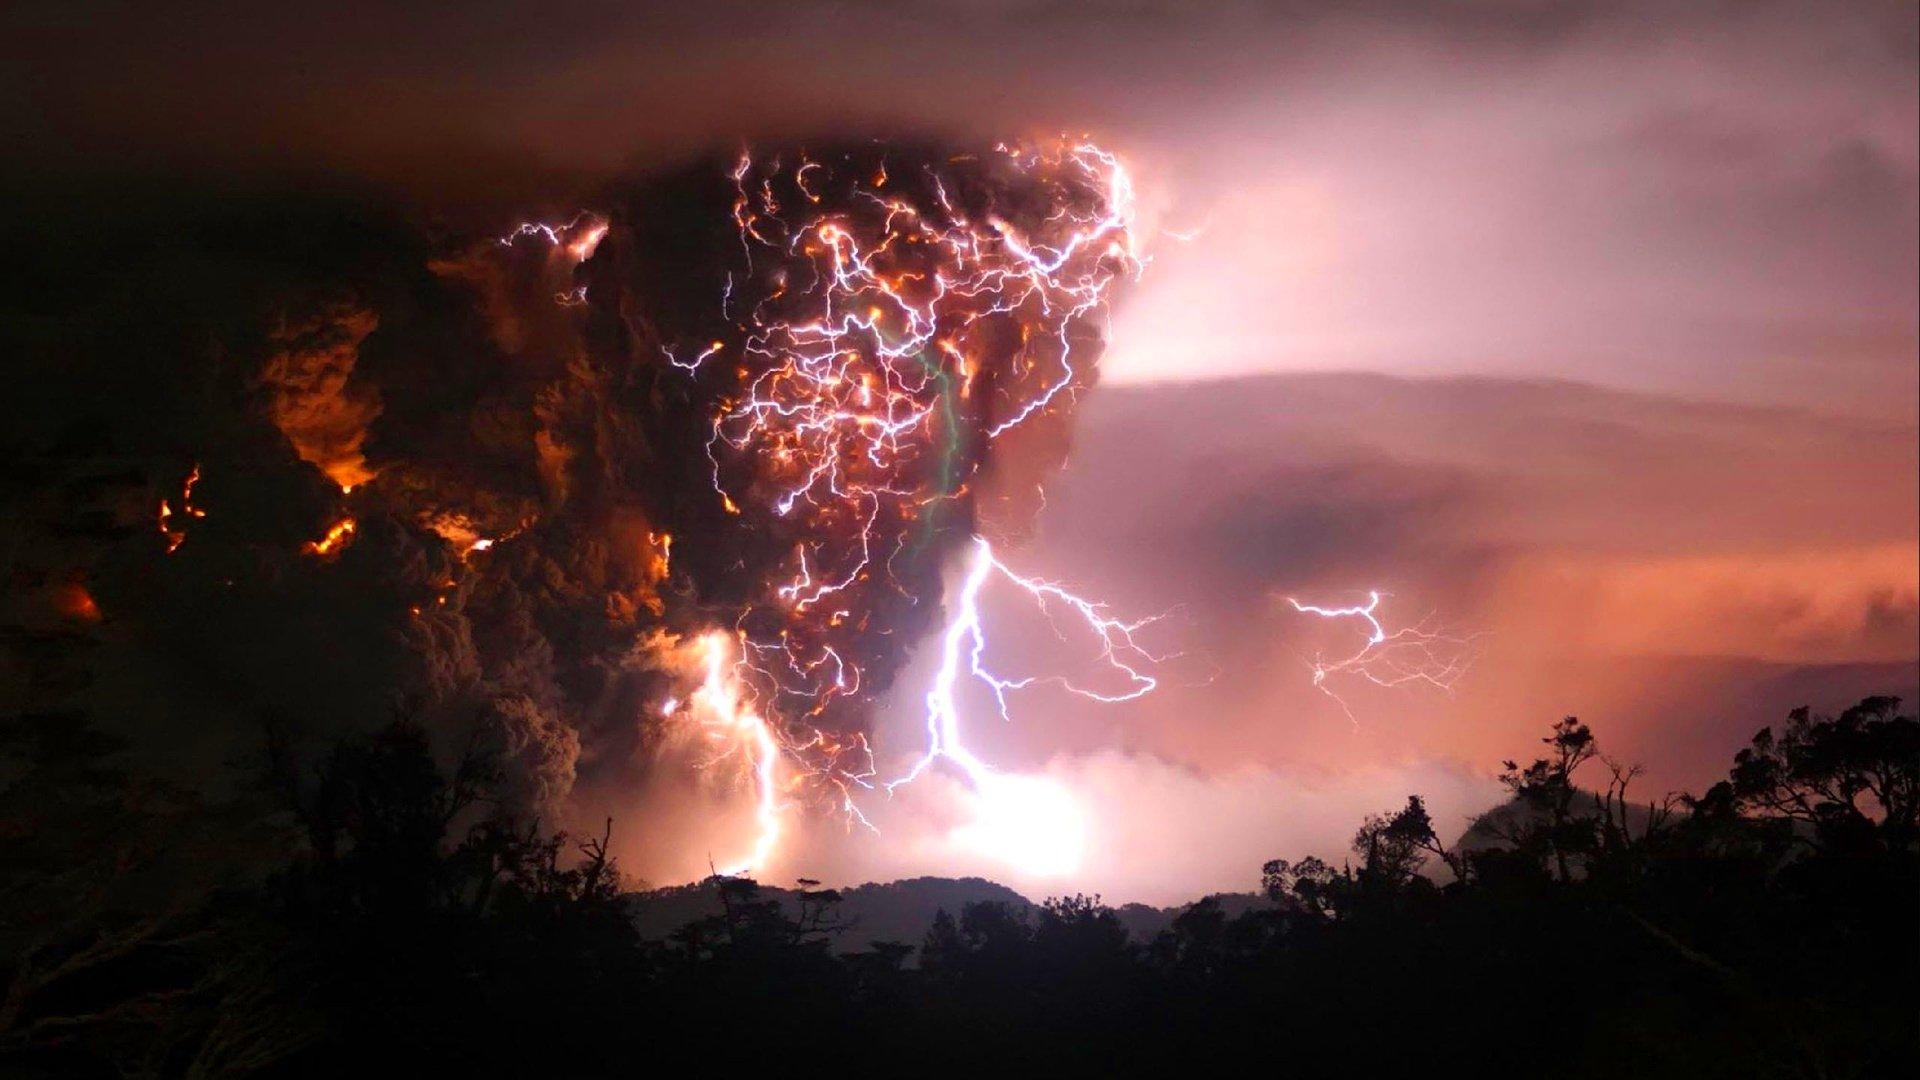 Lightning storm rain clouds sky nature thunderstorm ...